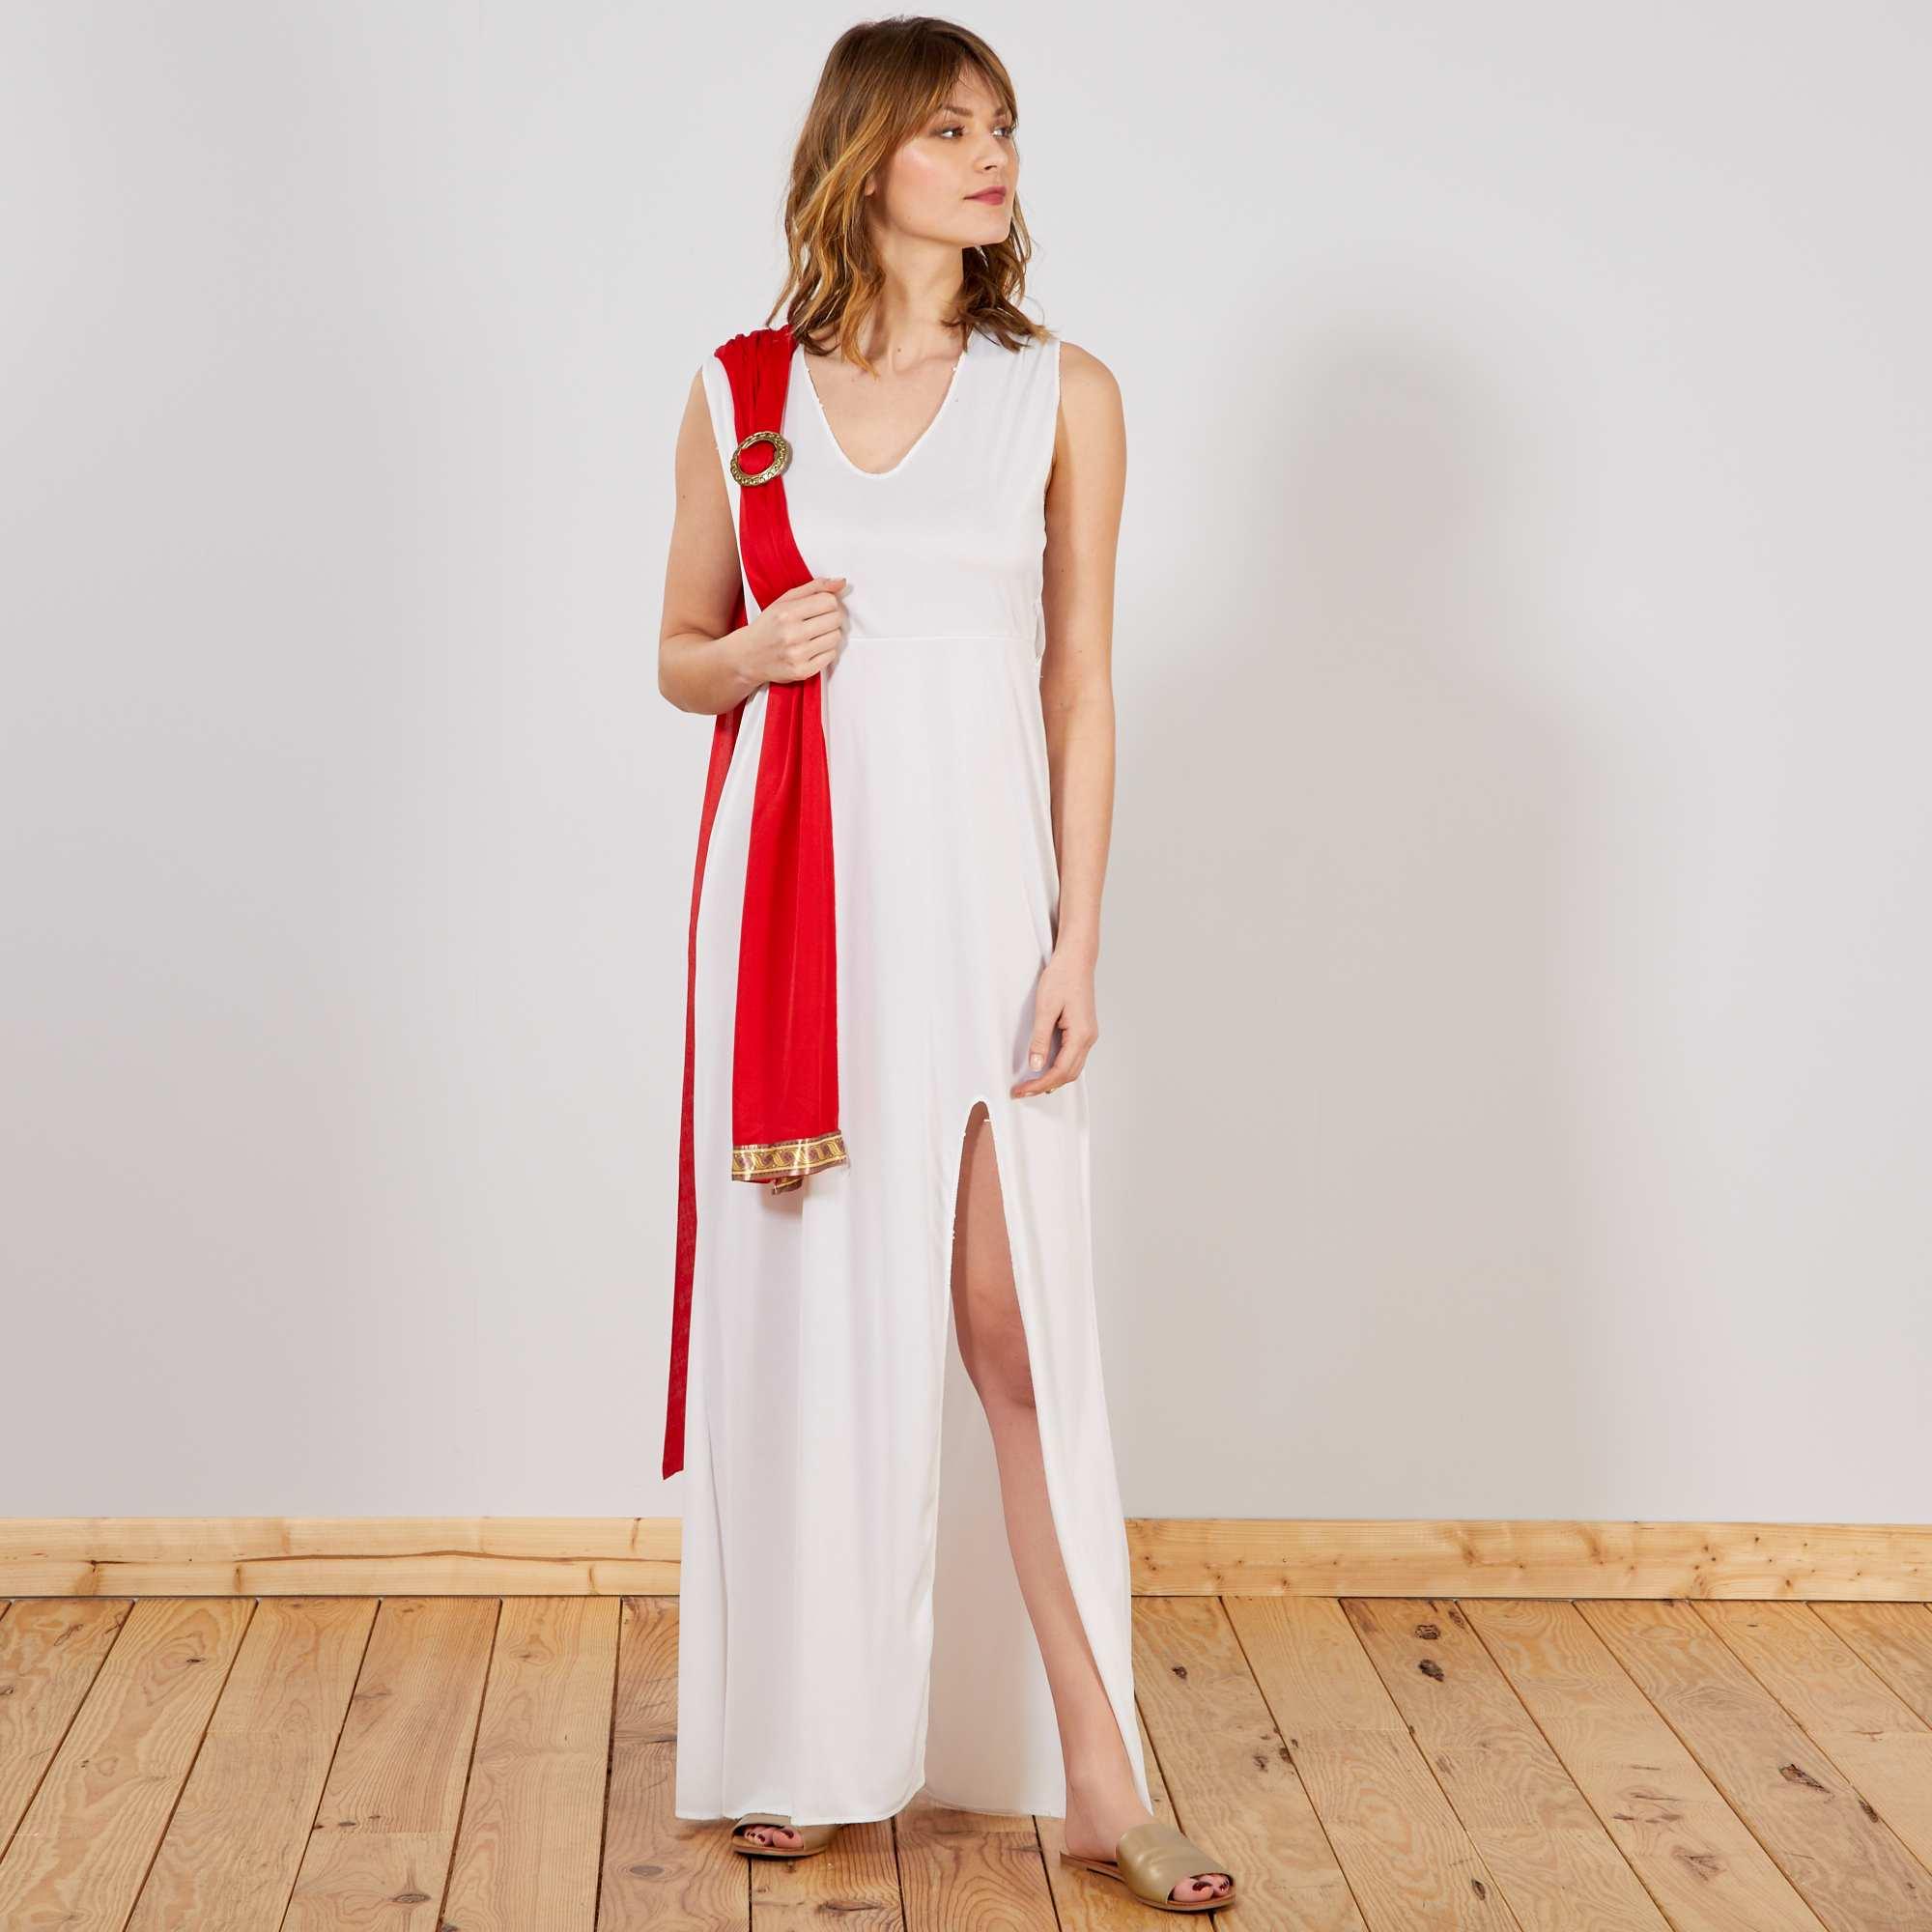 disfraz de diosa mujer blanco rojo kiabi 19 00. Black Bedroom Furniture Sets. Home Design Ideas